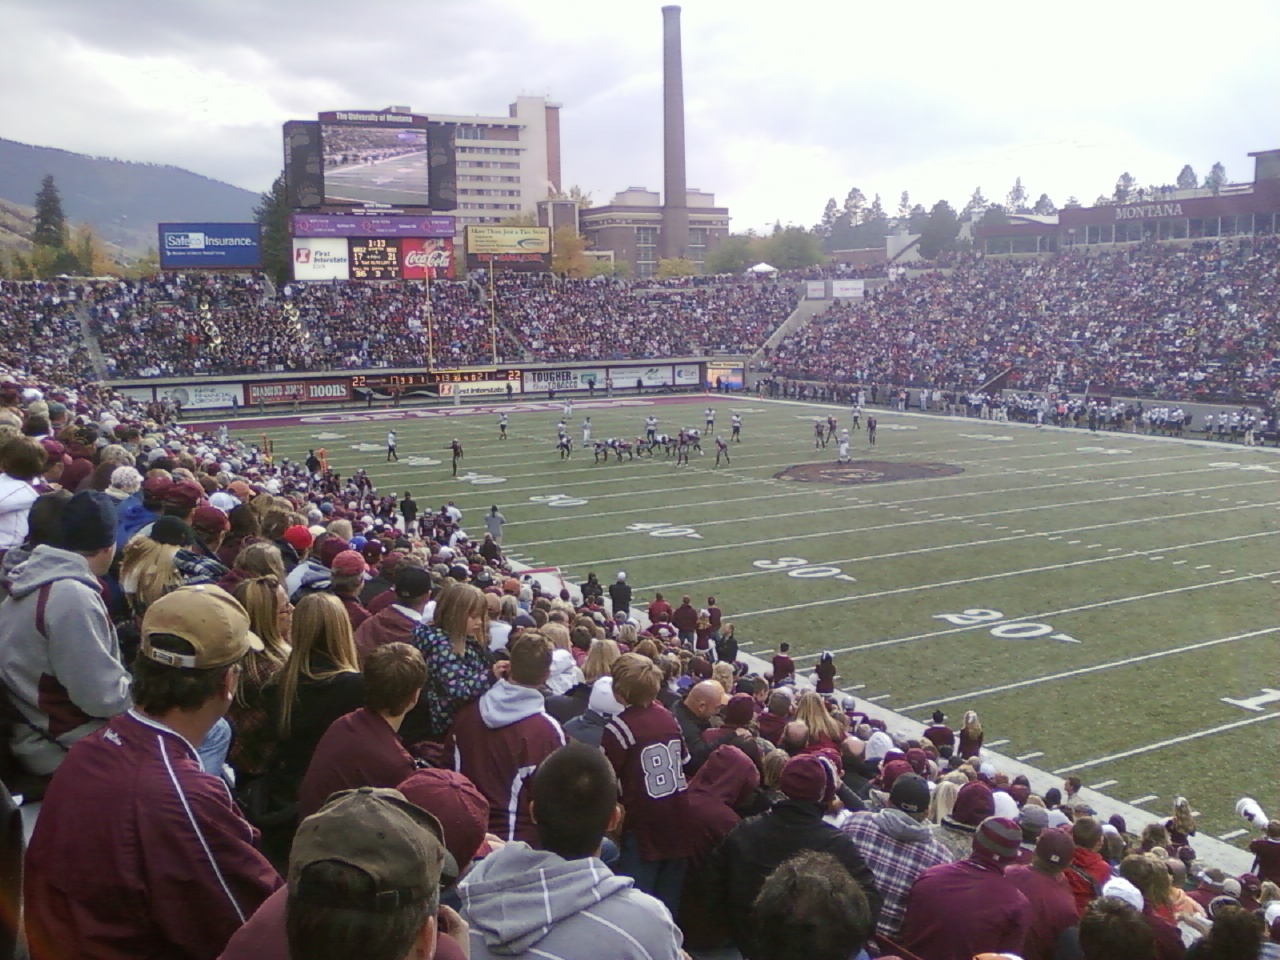 washington-grizzly stadium college stadiums